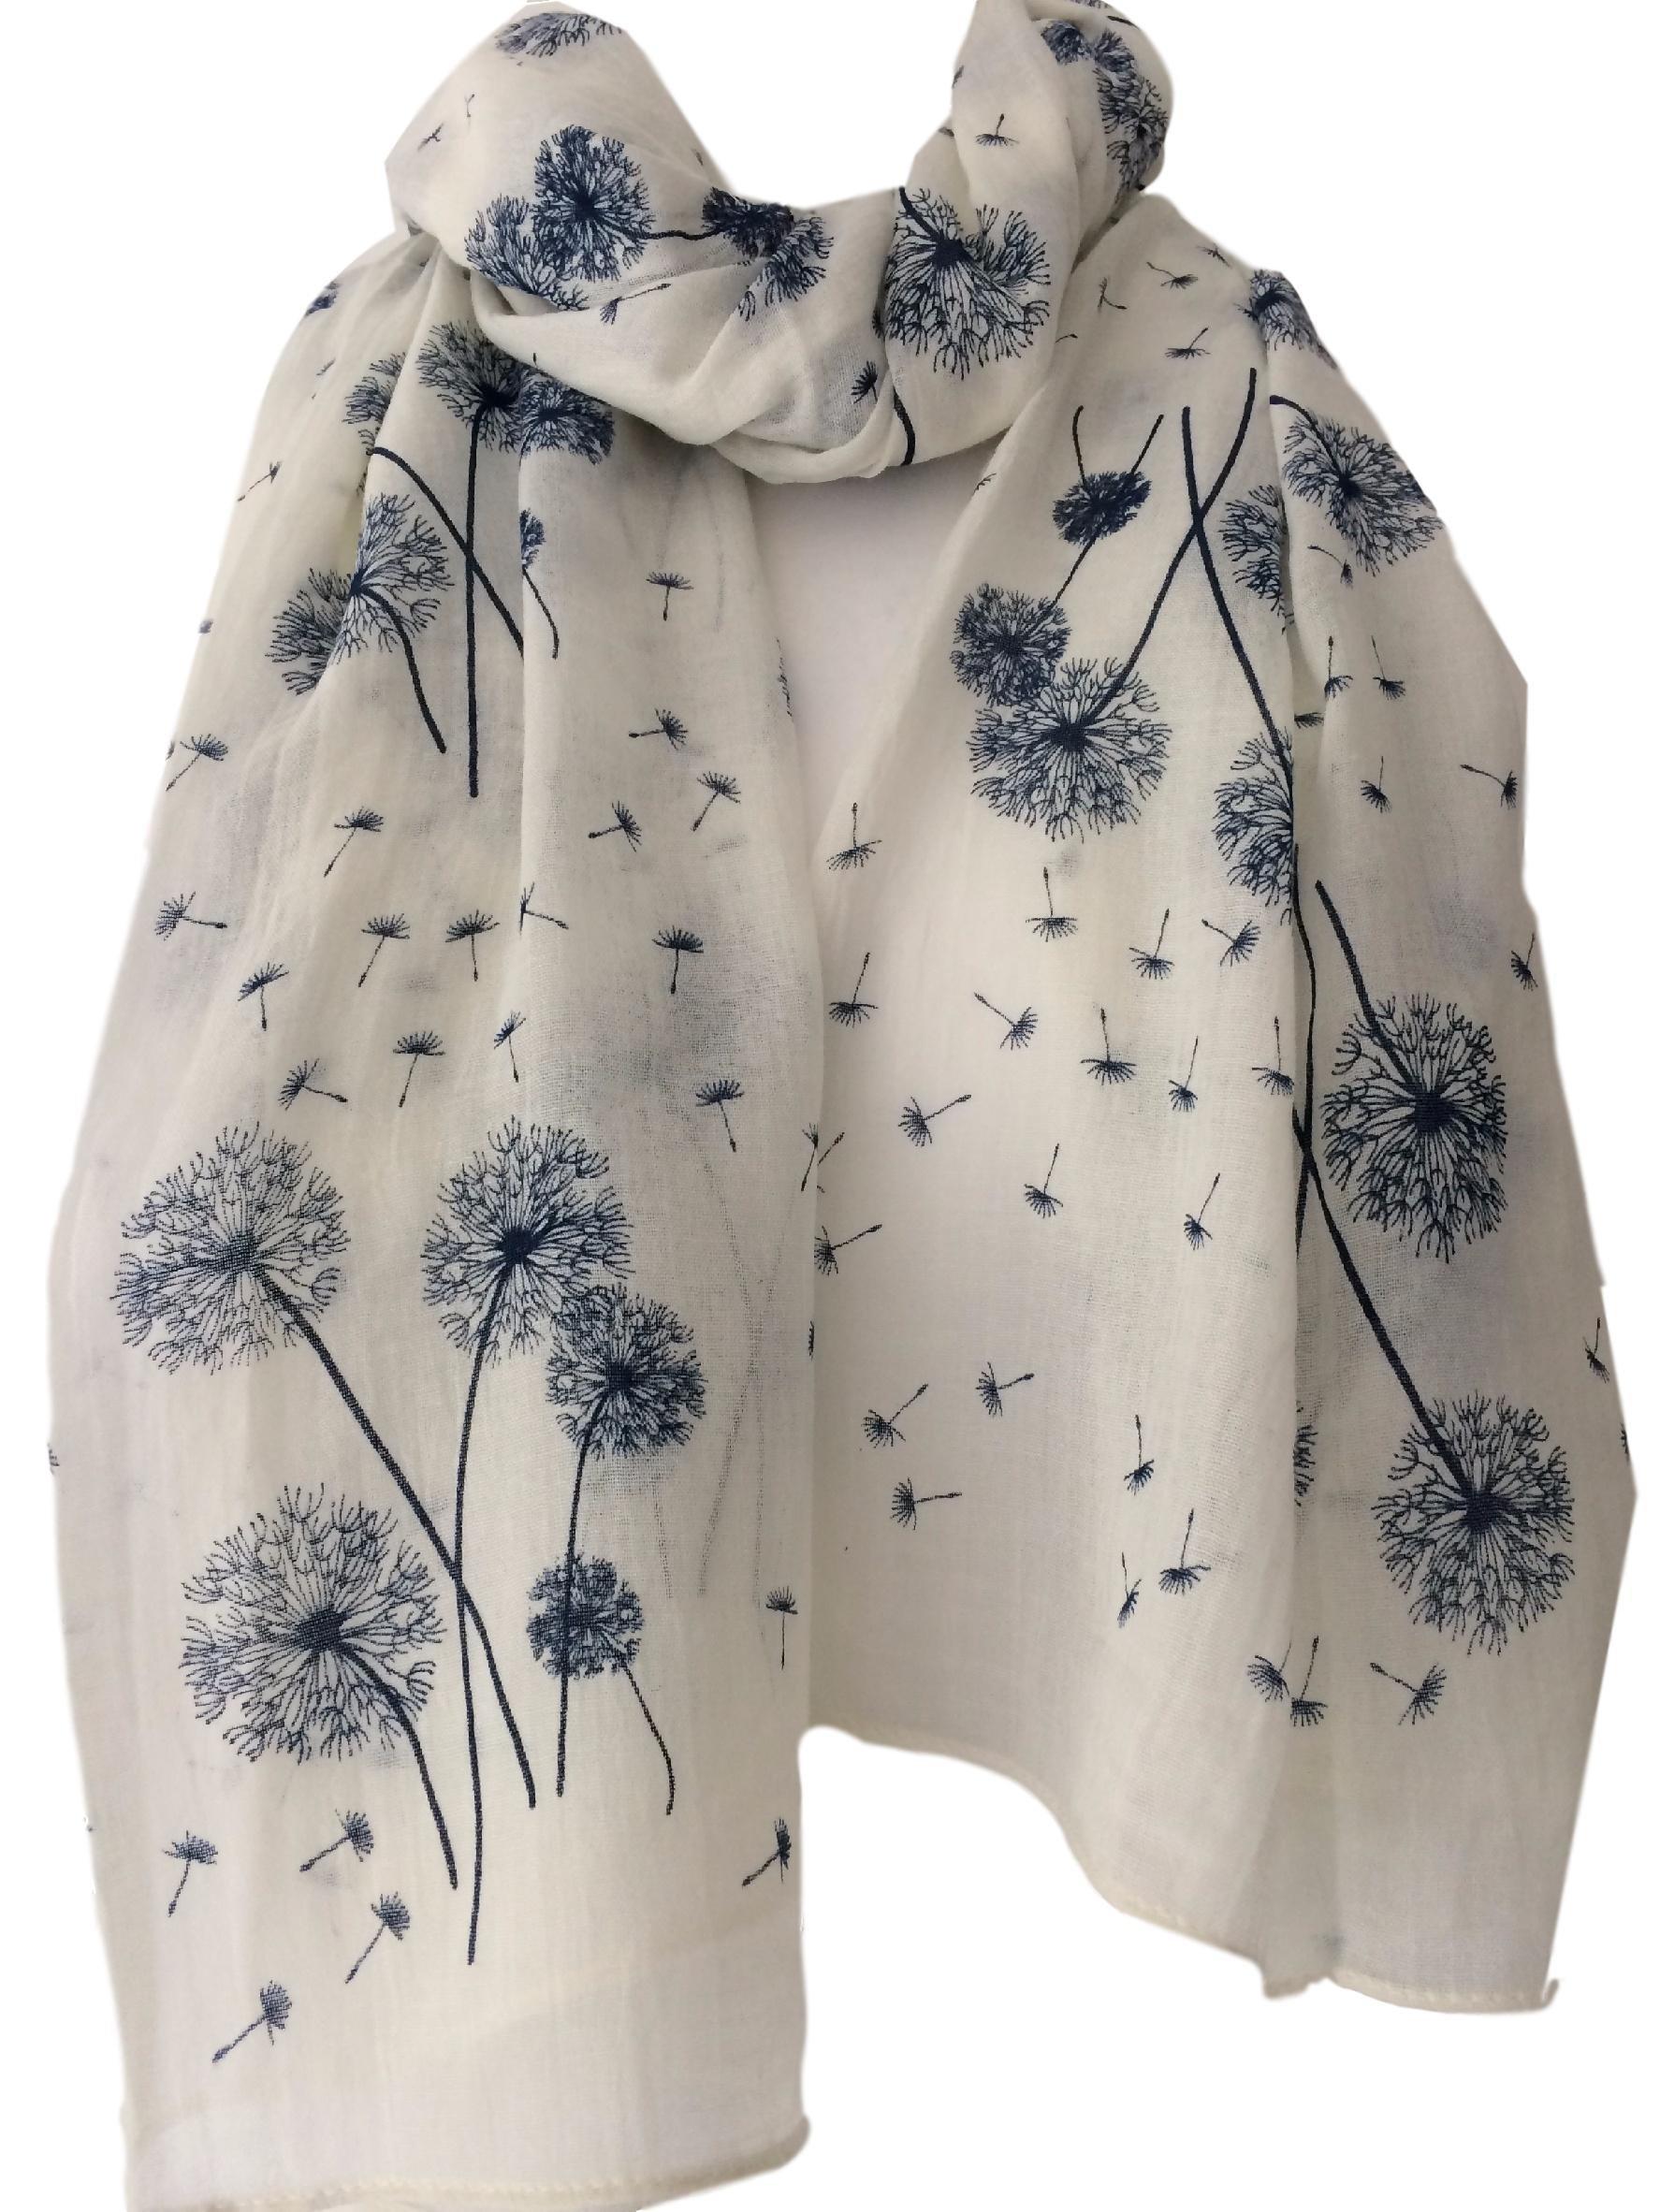 Purple possum® Cream Floral Scarf Ladies Ivory Navy Blue Flowers Wrap Dandelion Flower Shawl